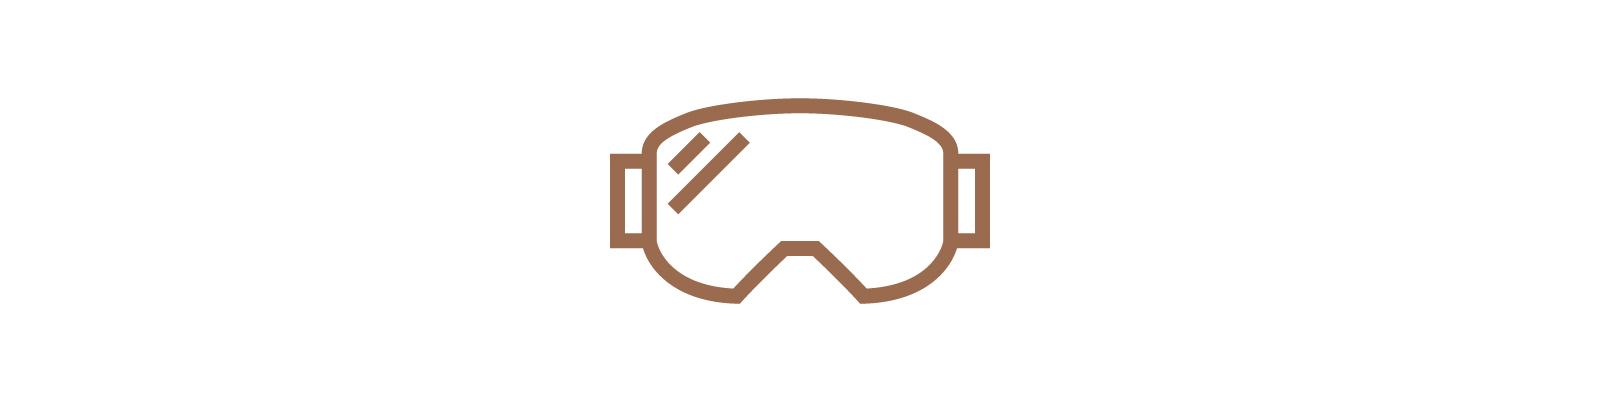 Icon_Glasses.jpg